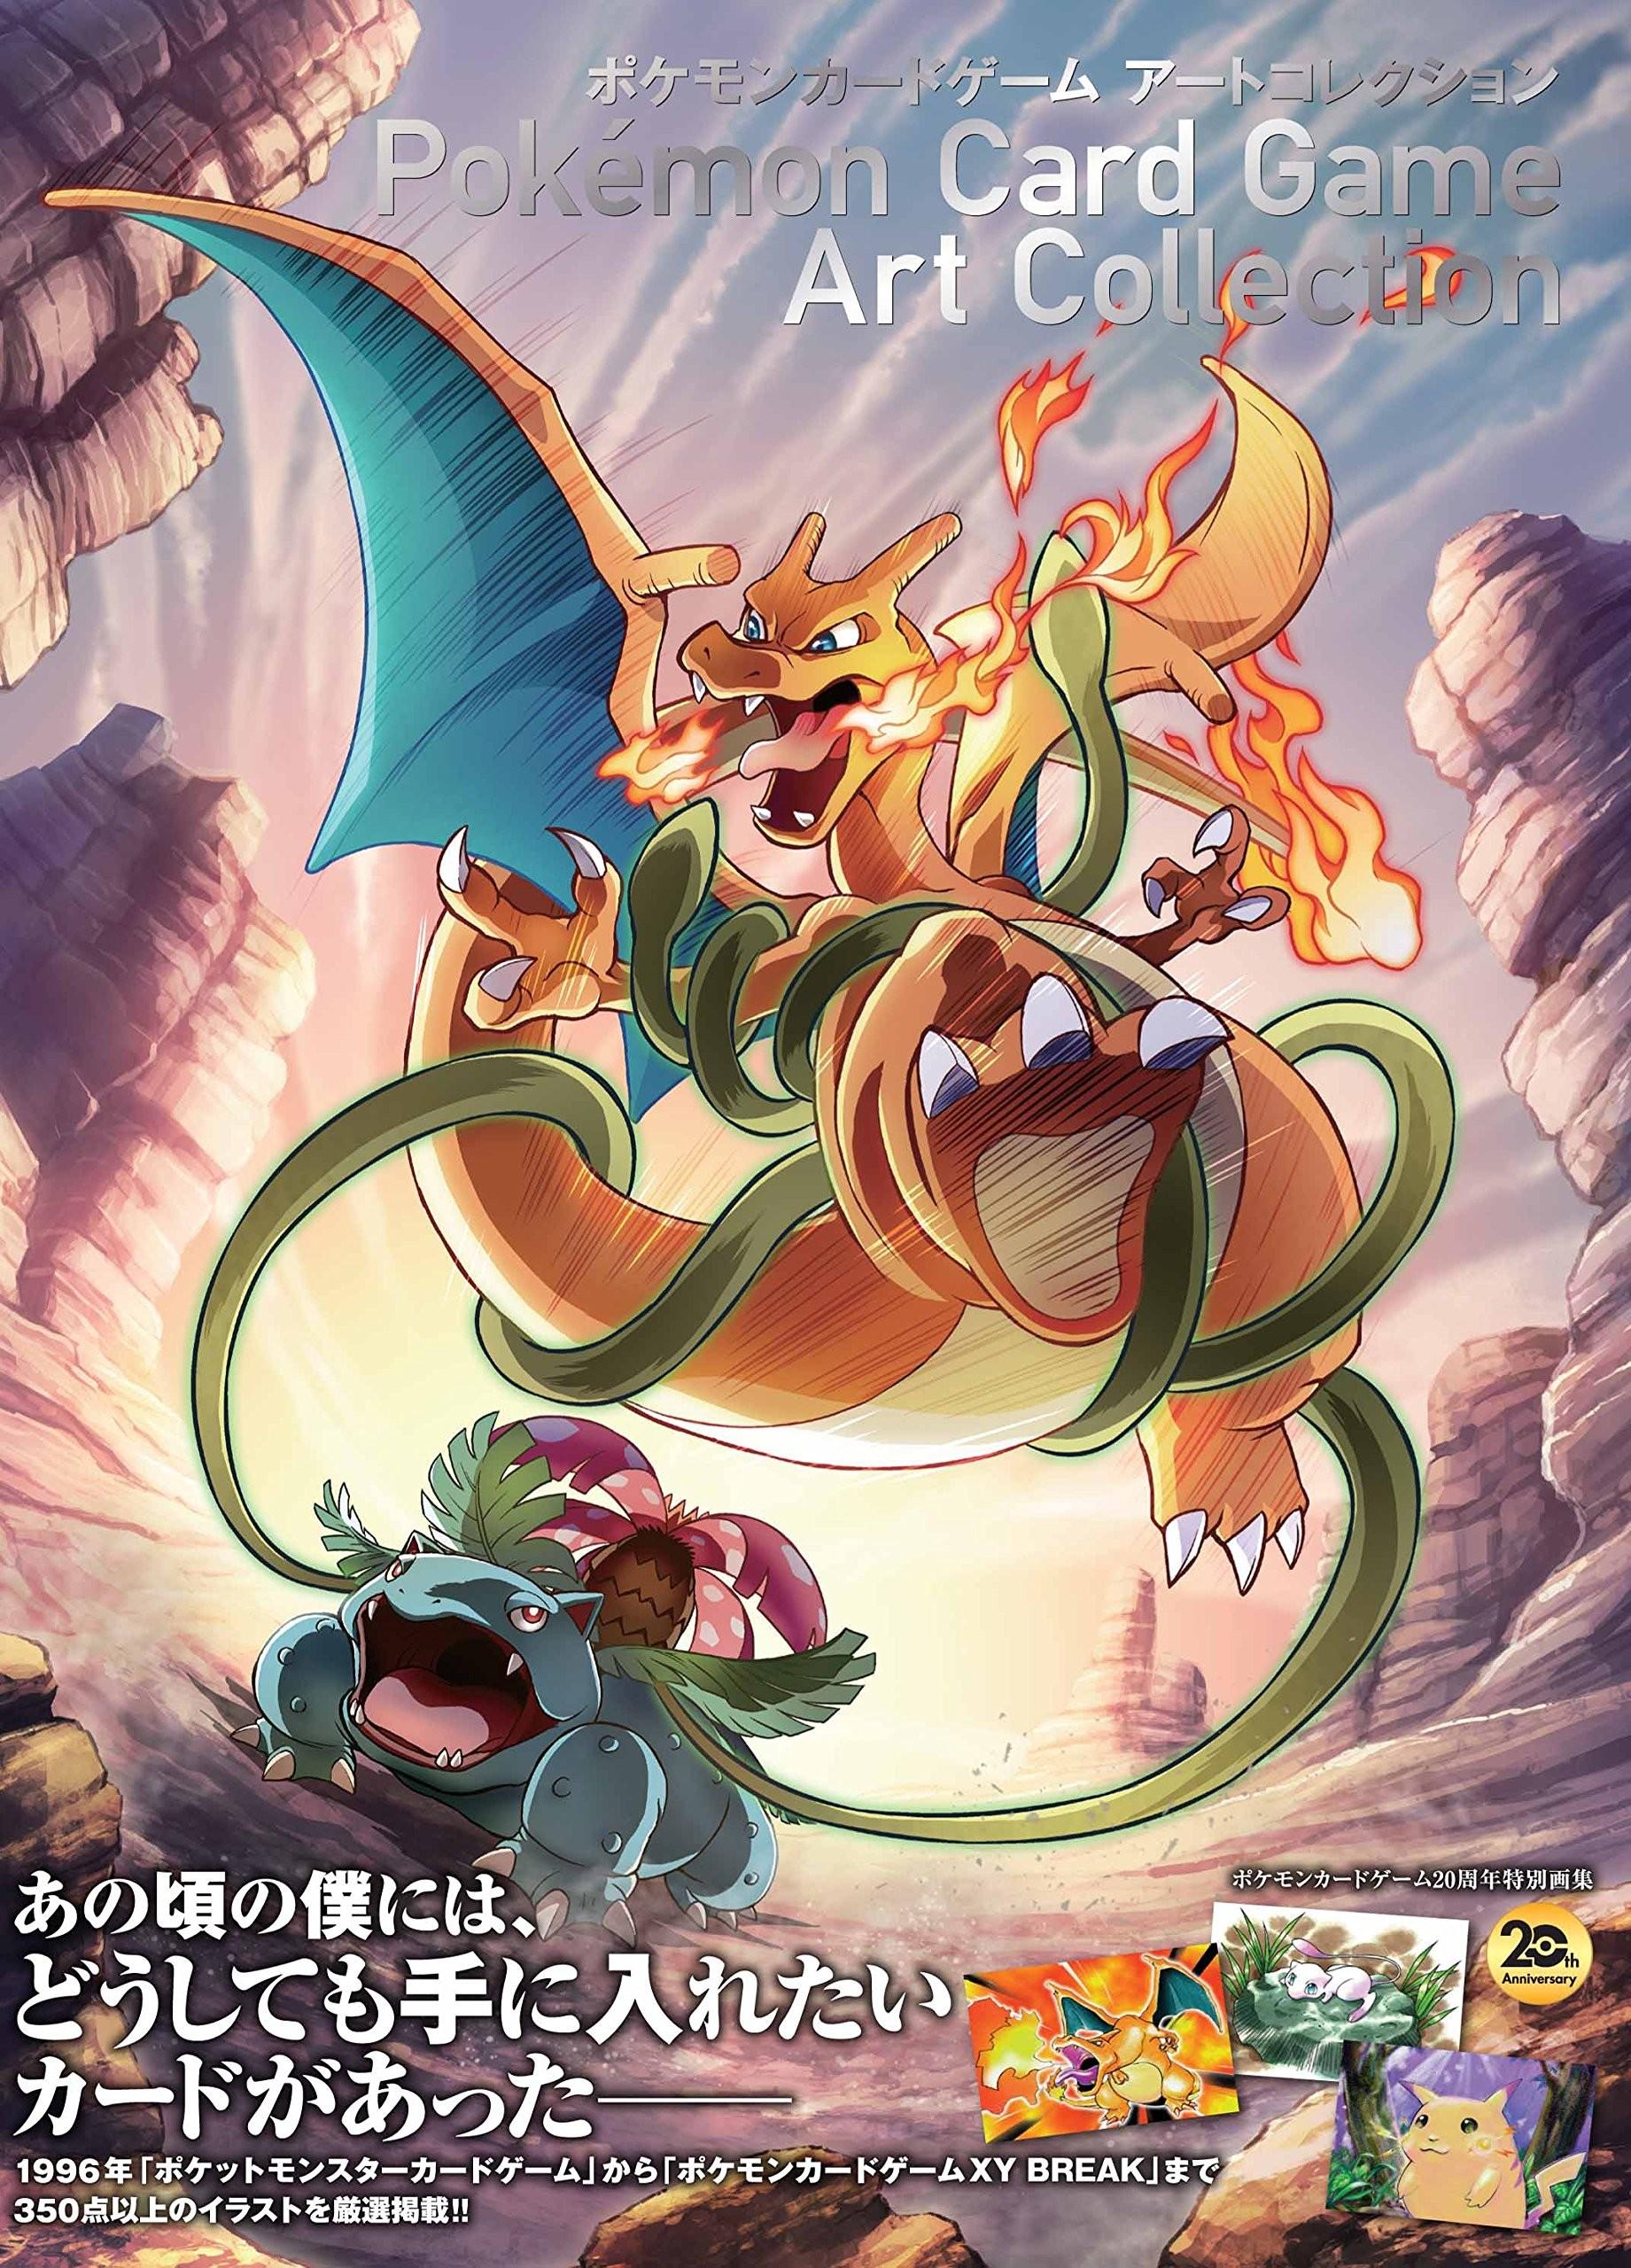 Pokémon Card Game Art Collection - Japanese Import